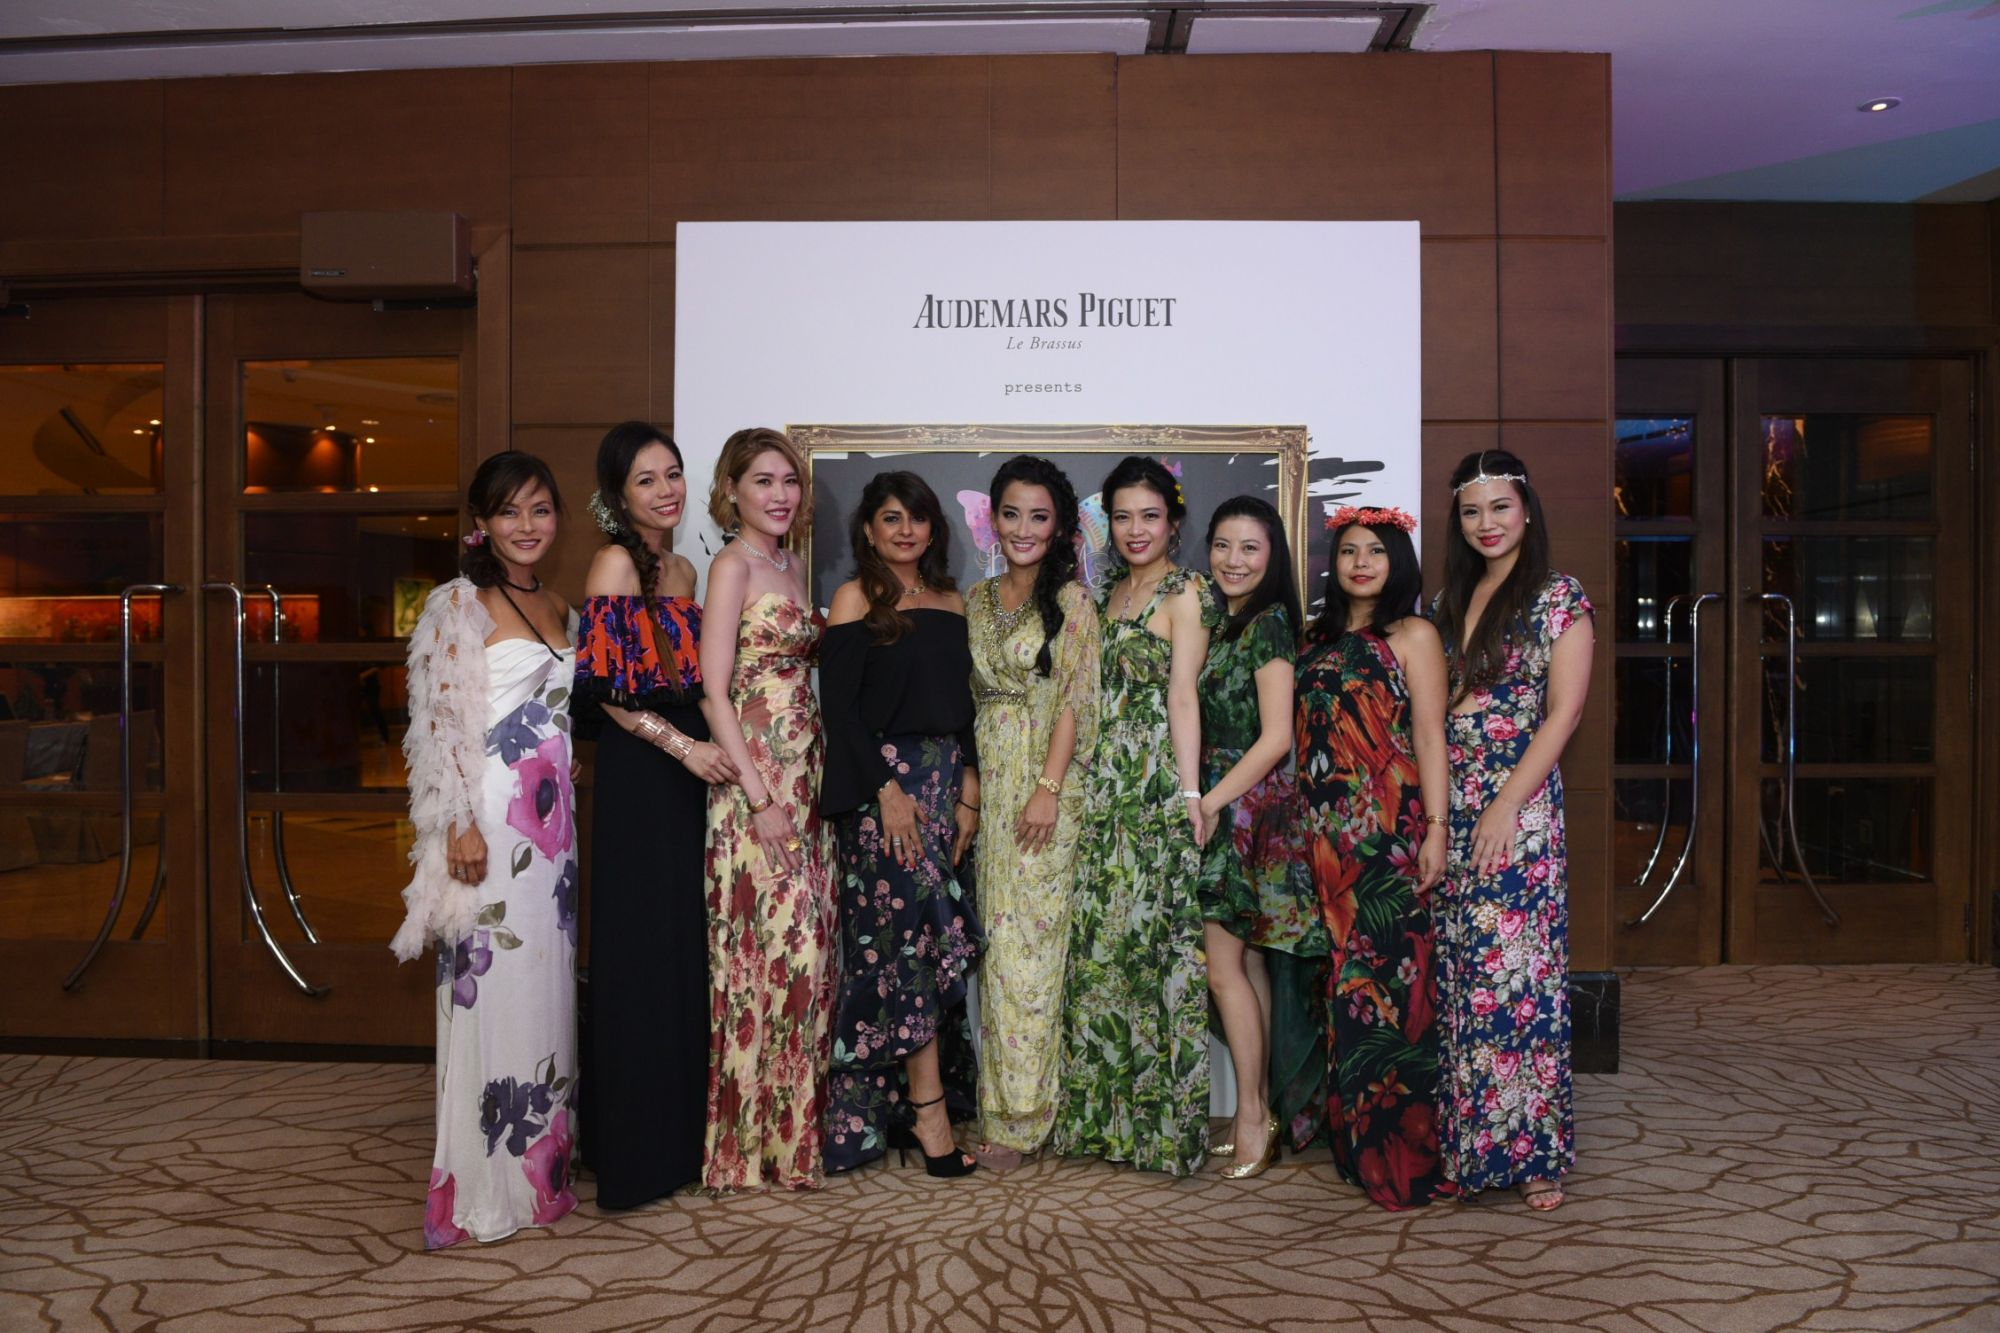 Patricia Yuen, Ginny Wiluan, Michelle Eng, Bina Rampuria, Tiara Shaw, Ho Ching Lin, Jaelle Ang, Marilyn Lum, Tjin Lee